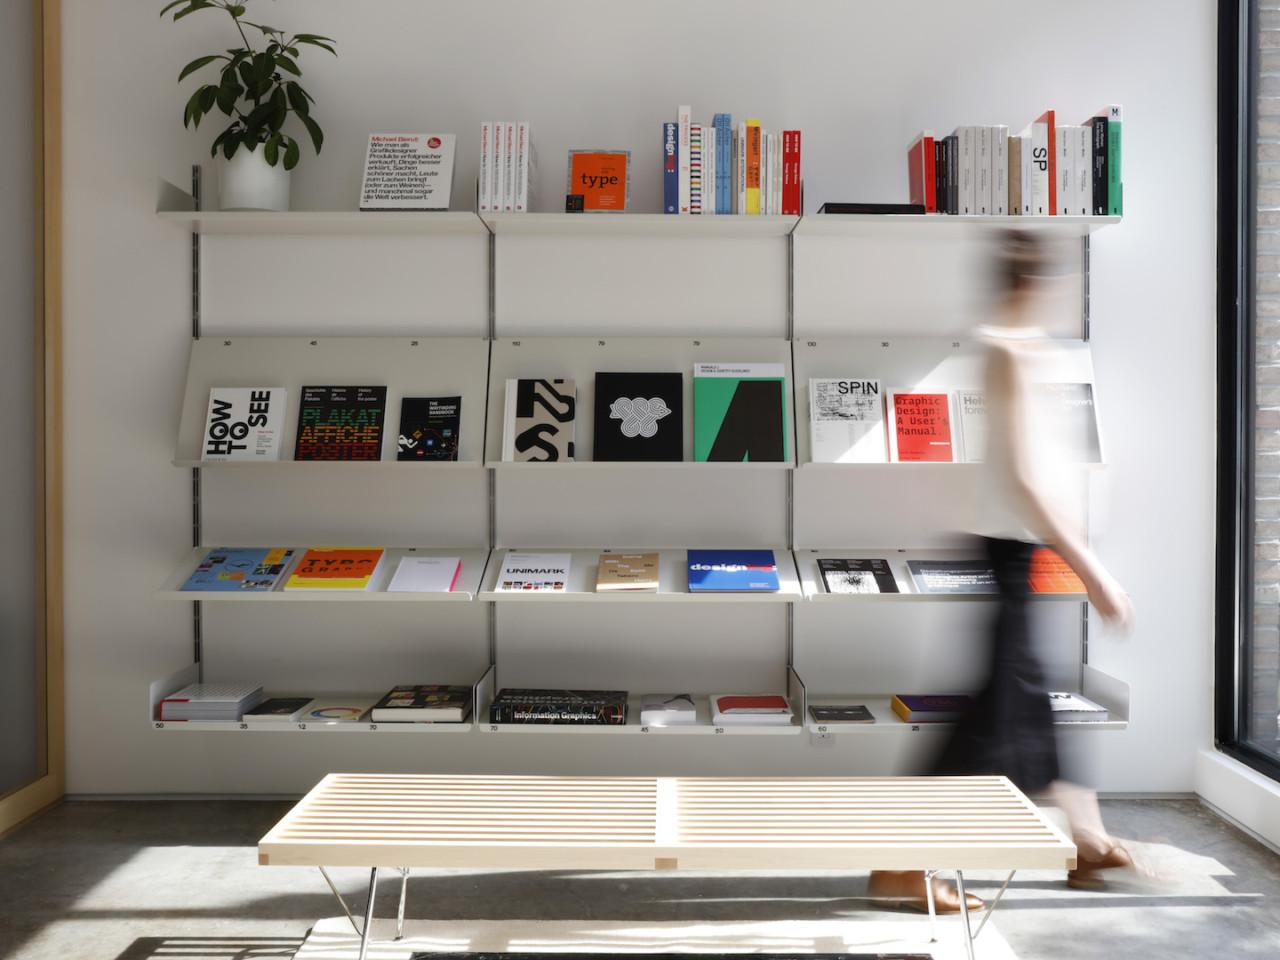 leibal_standards-manual-bookstore_standards-manual_8.jpg